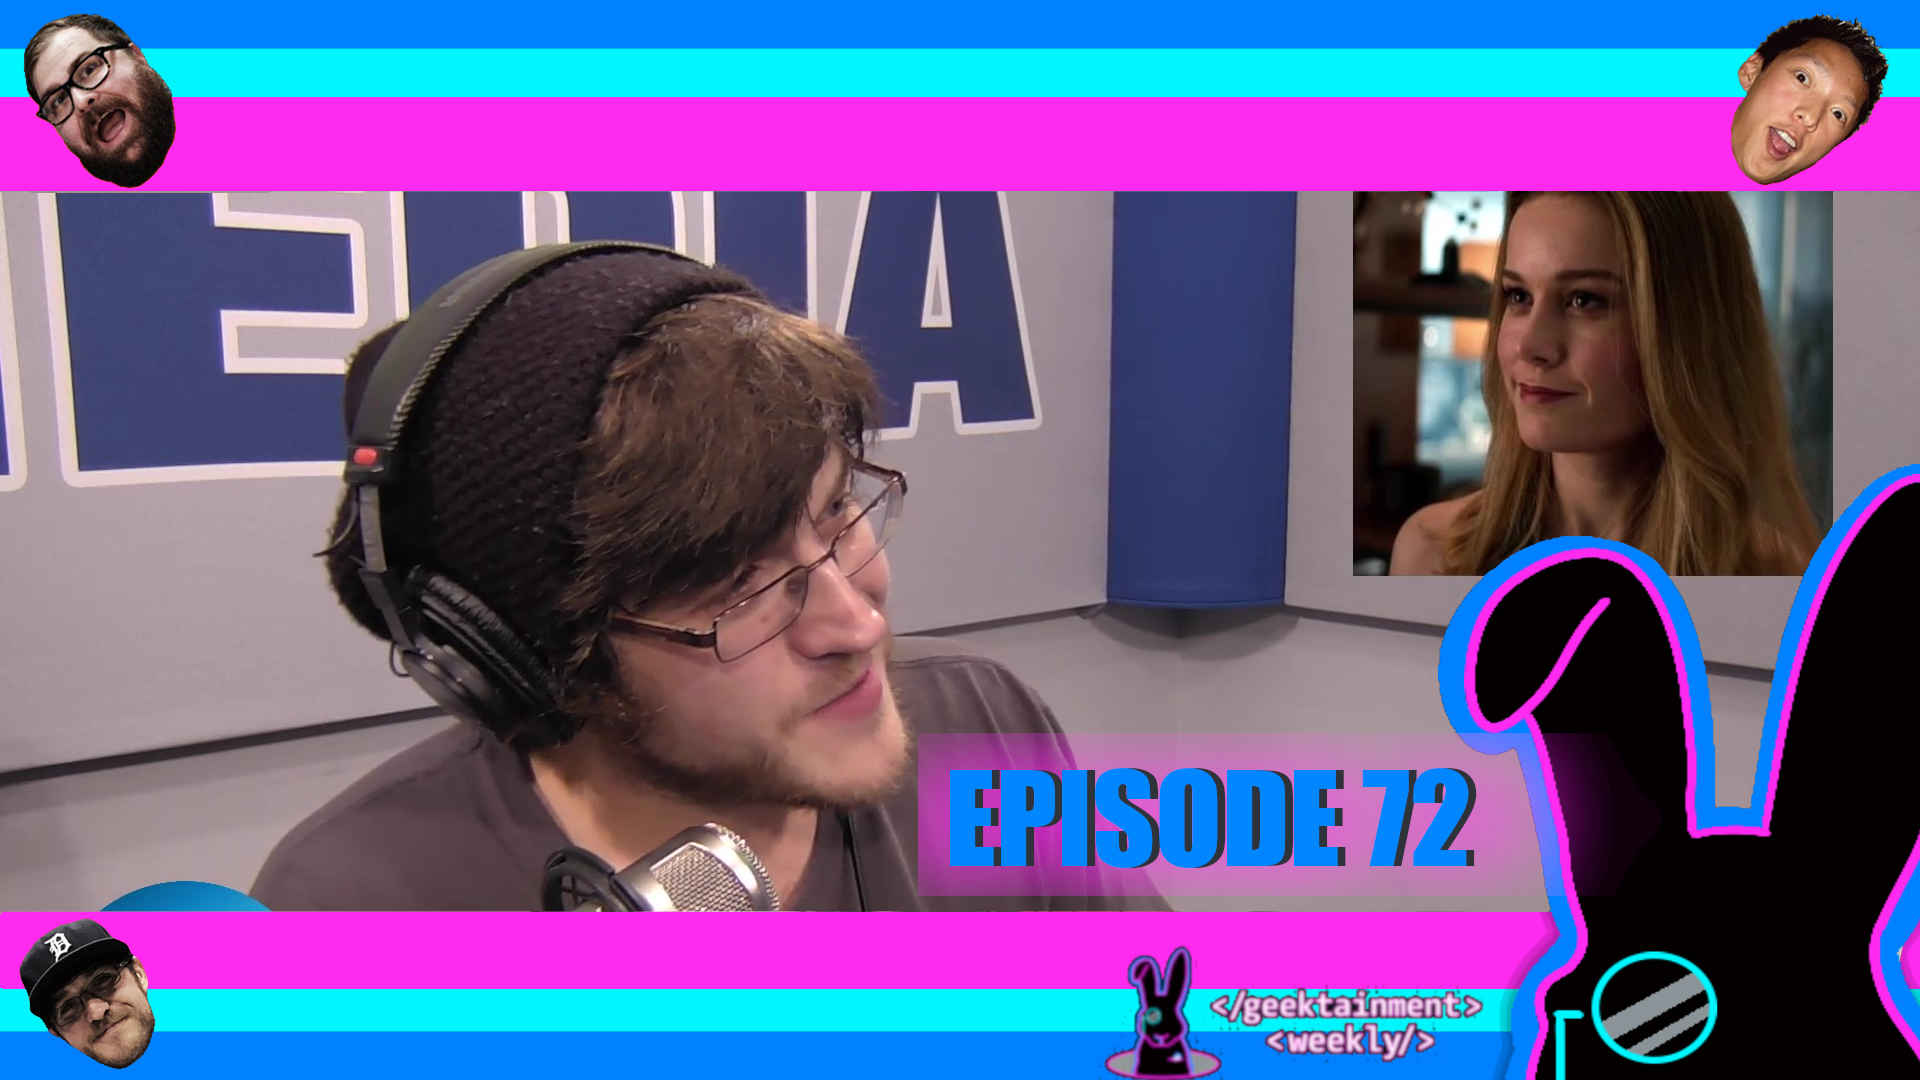 Geektainment Weekly - Episode 72